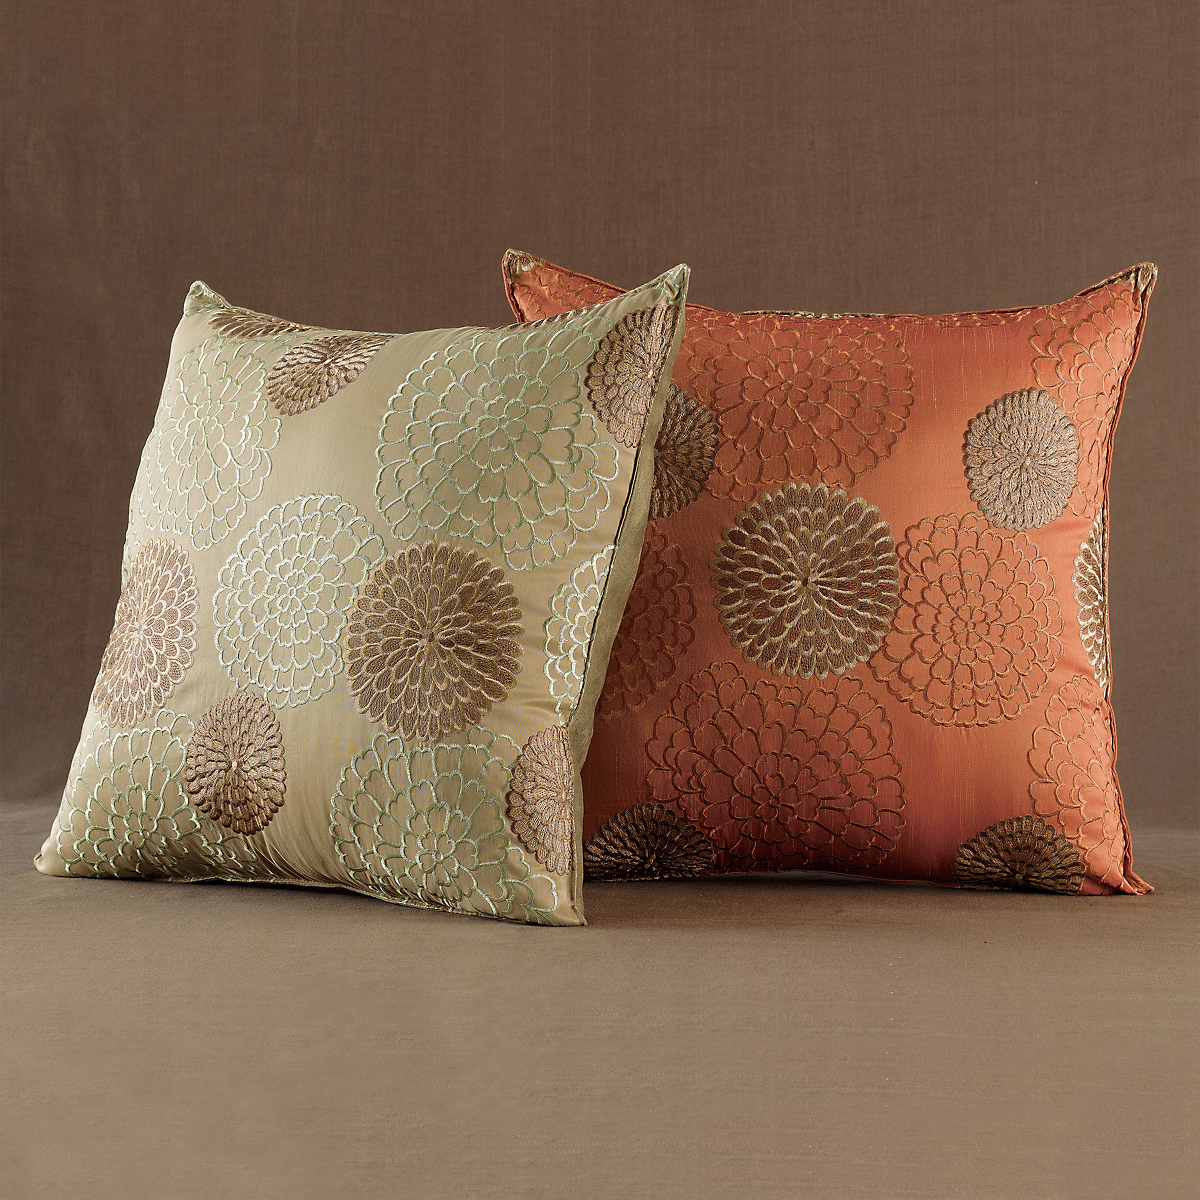 Chrysanthemum Square Pillows